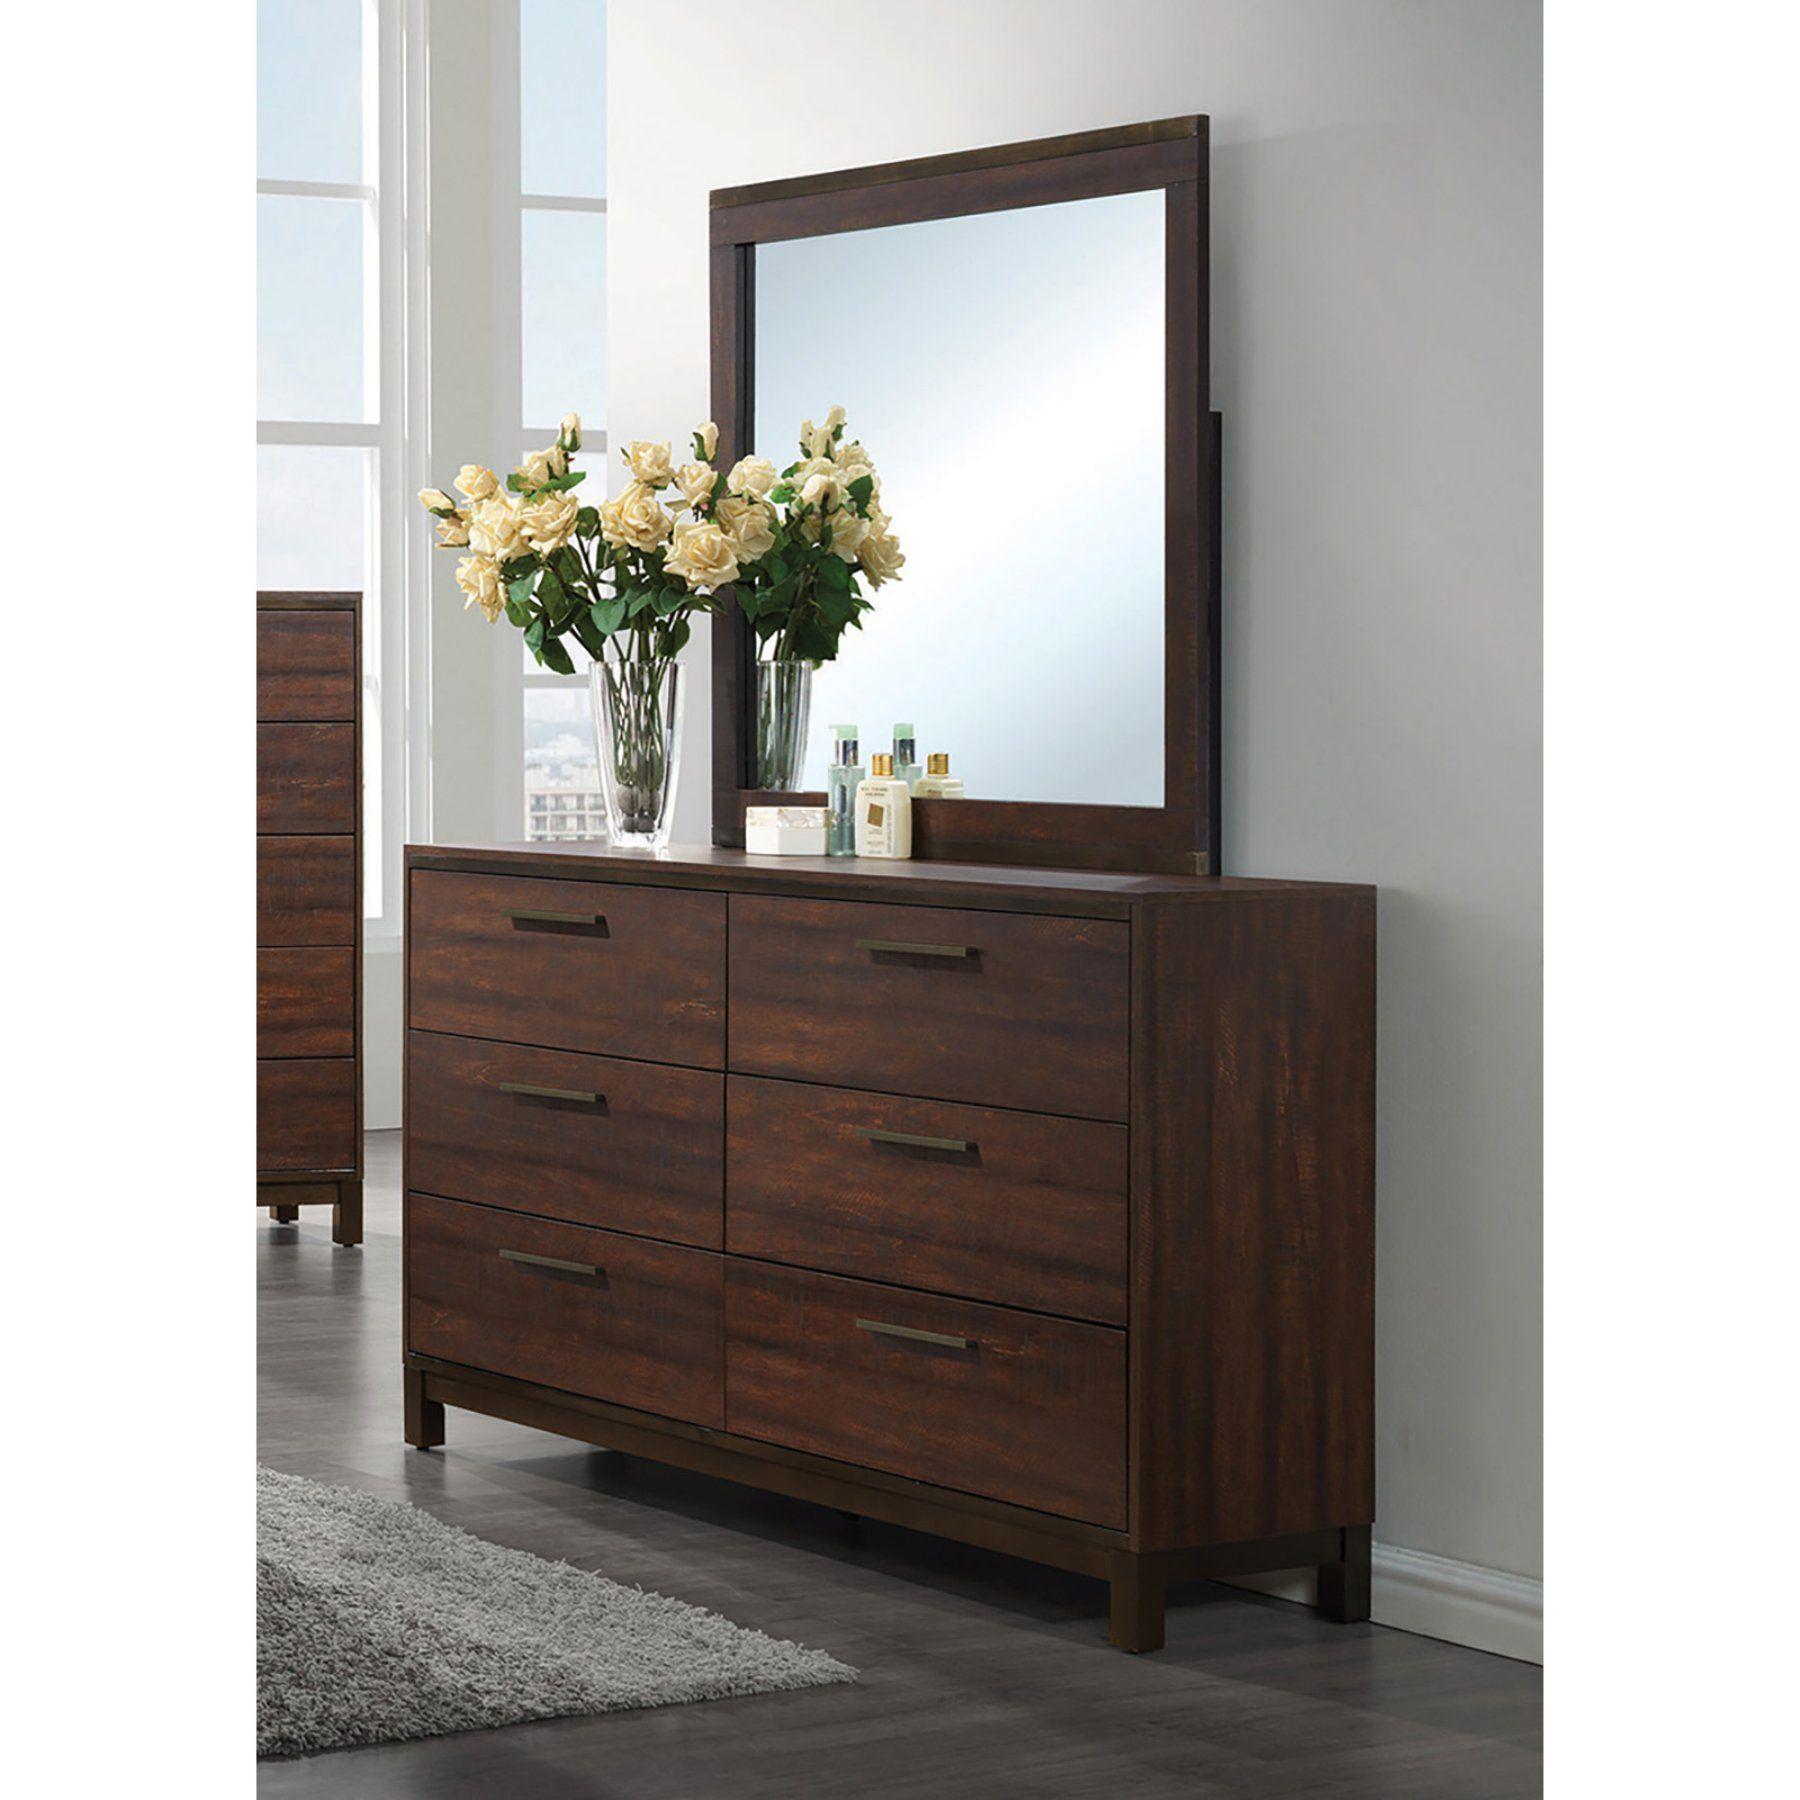 Coaster Furniture Edmonton 6 Drawer Dresser Coa3638